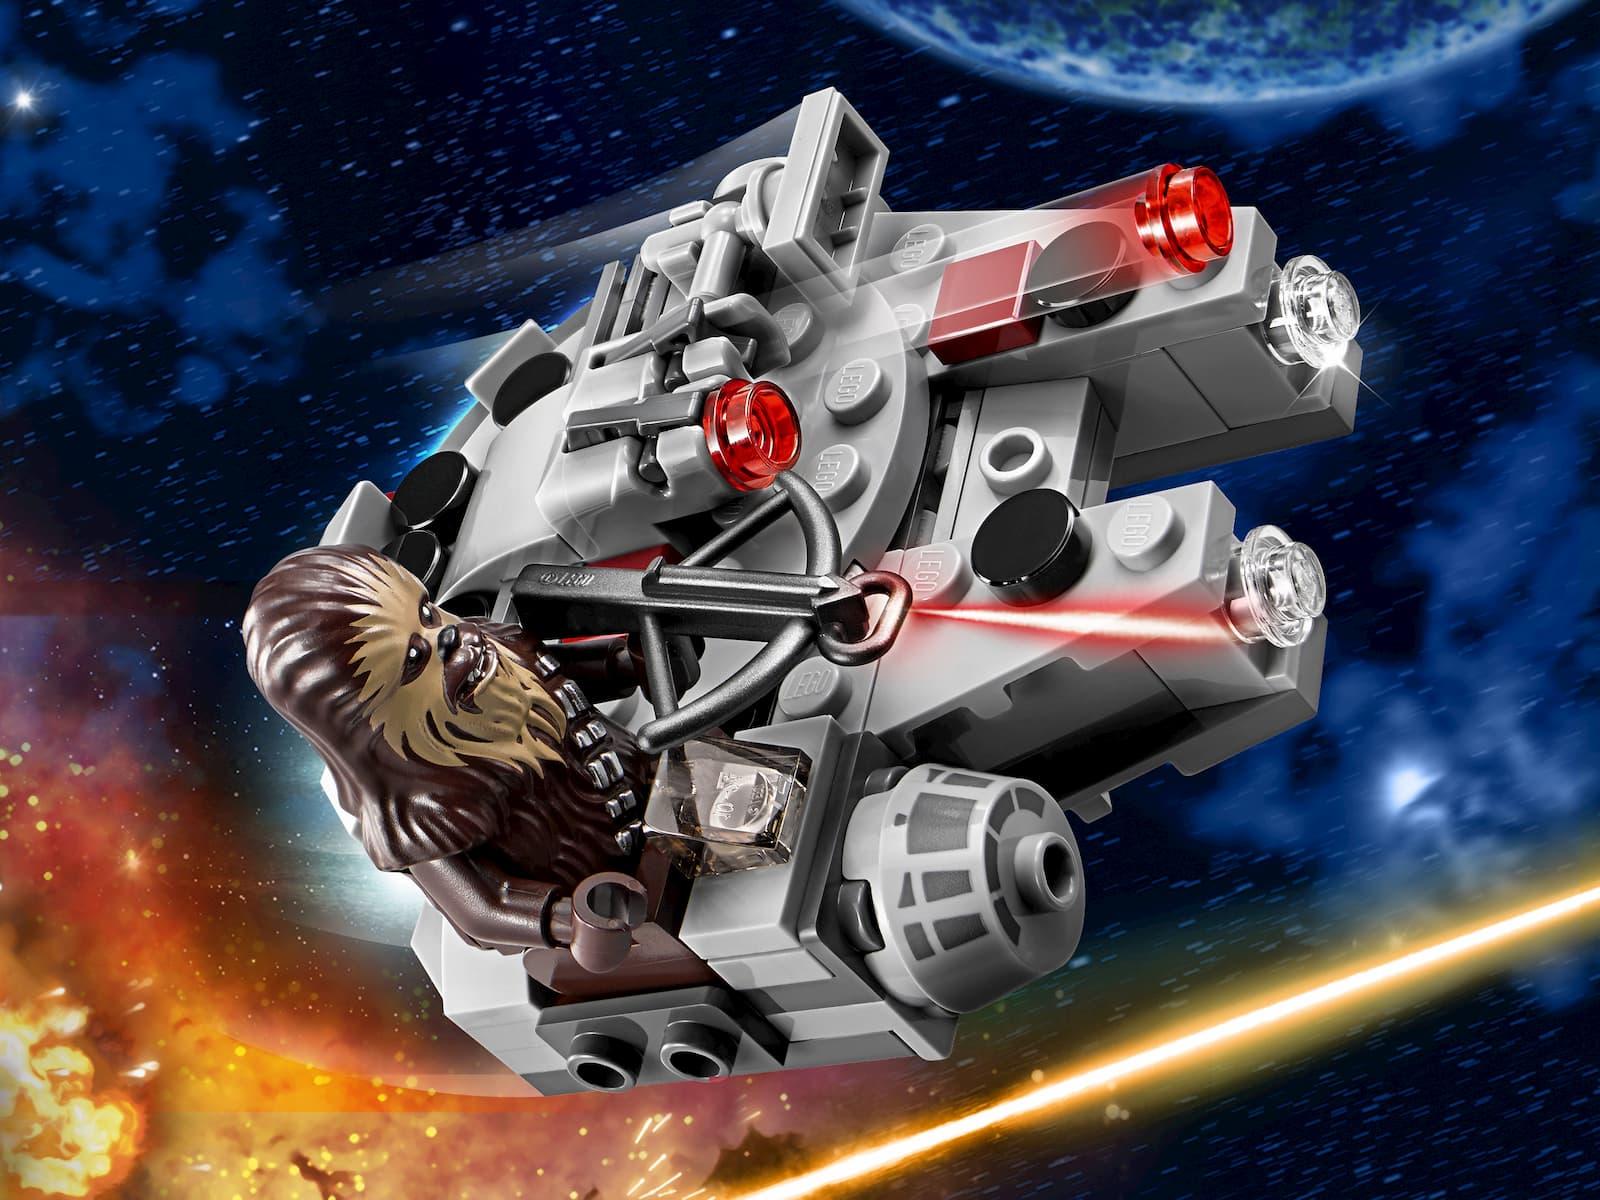 Конструктор Bl «Микрофайтер Сокол Тысячелетия» 10893 (Star Wars 75193) / 98 деталей